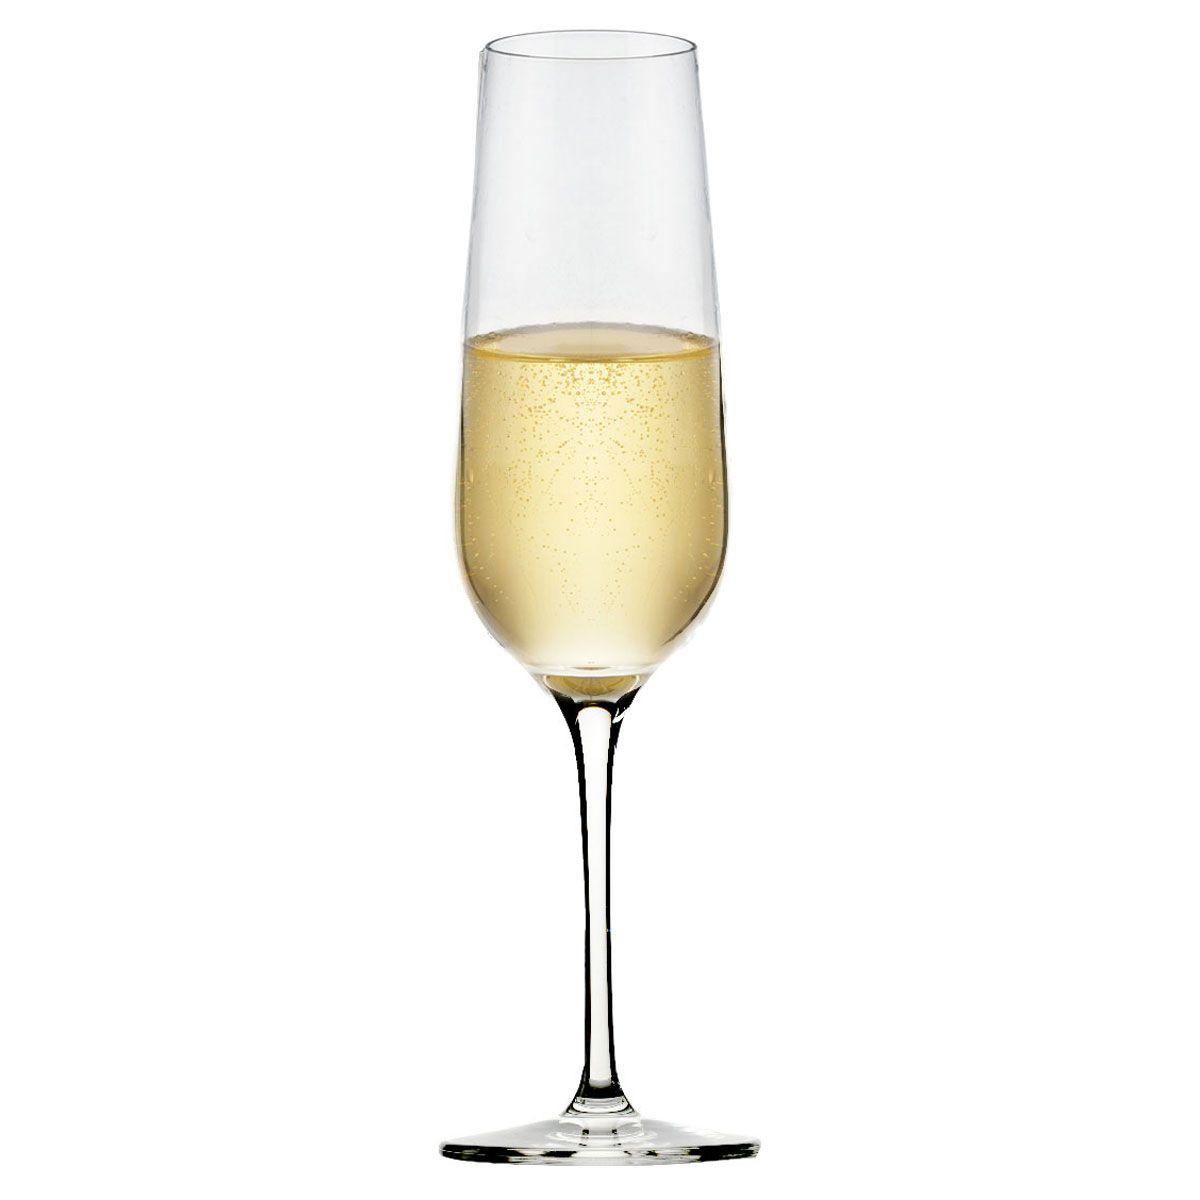 Taça Champagne - Taça Champanhe Sensation Flute 200ml